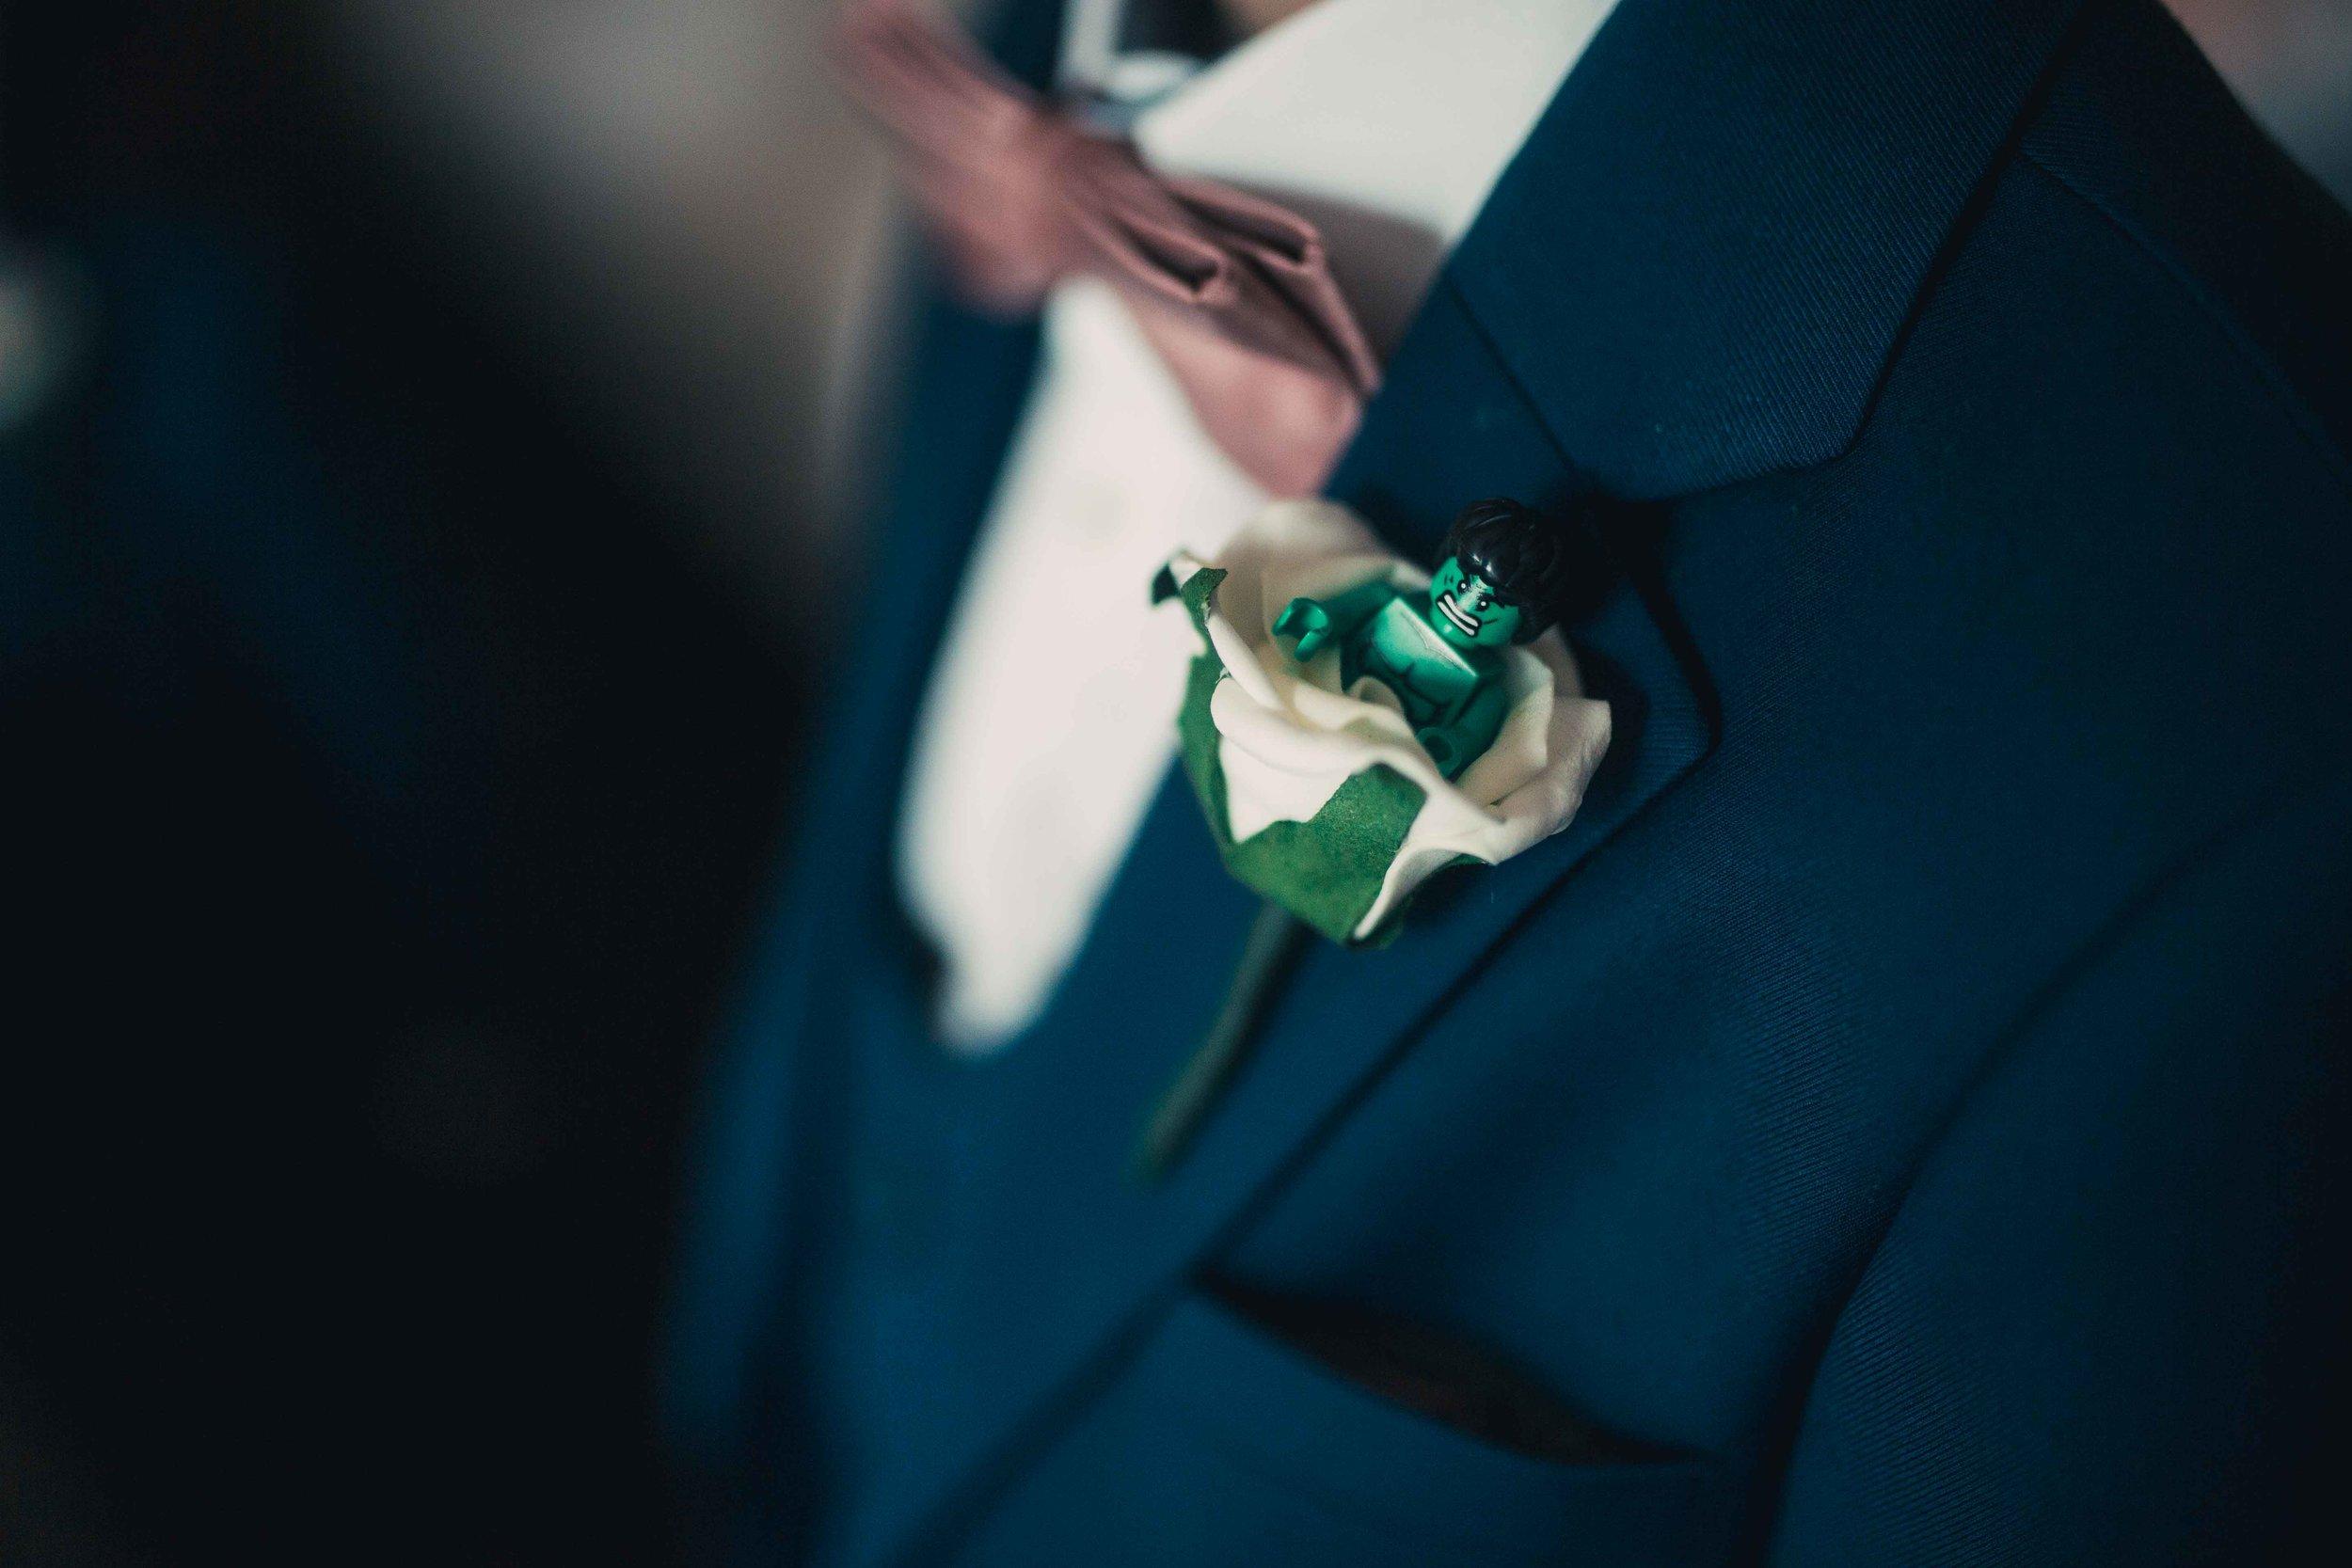 Lea-cooper-photography-willenhall-wolverhampton-wedding-photographer-birmingham-shirley-west-midlands-ceremony-church-19.JPG